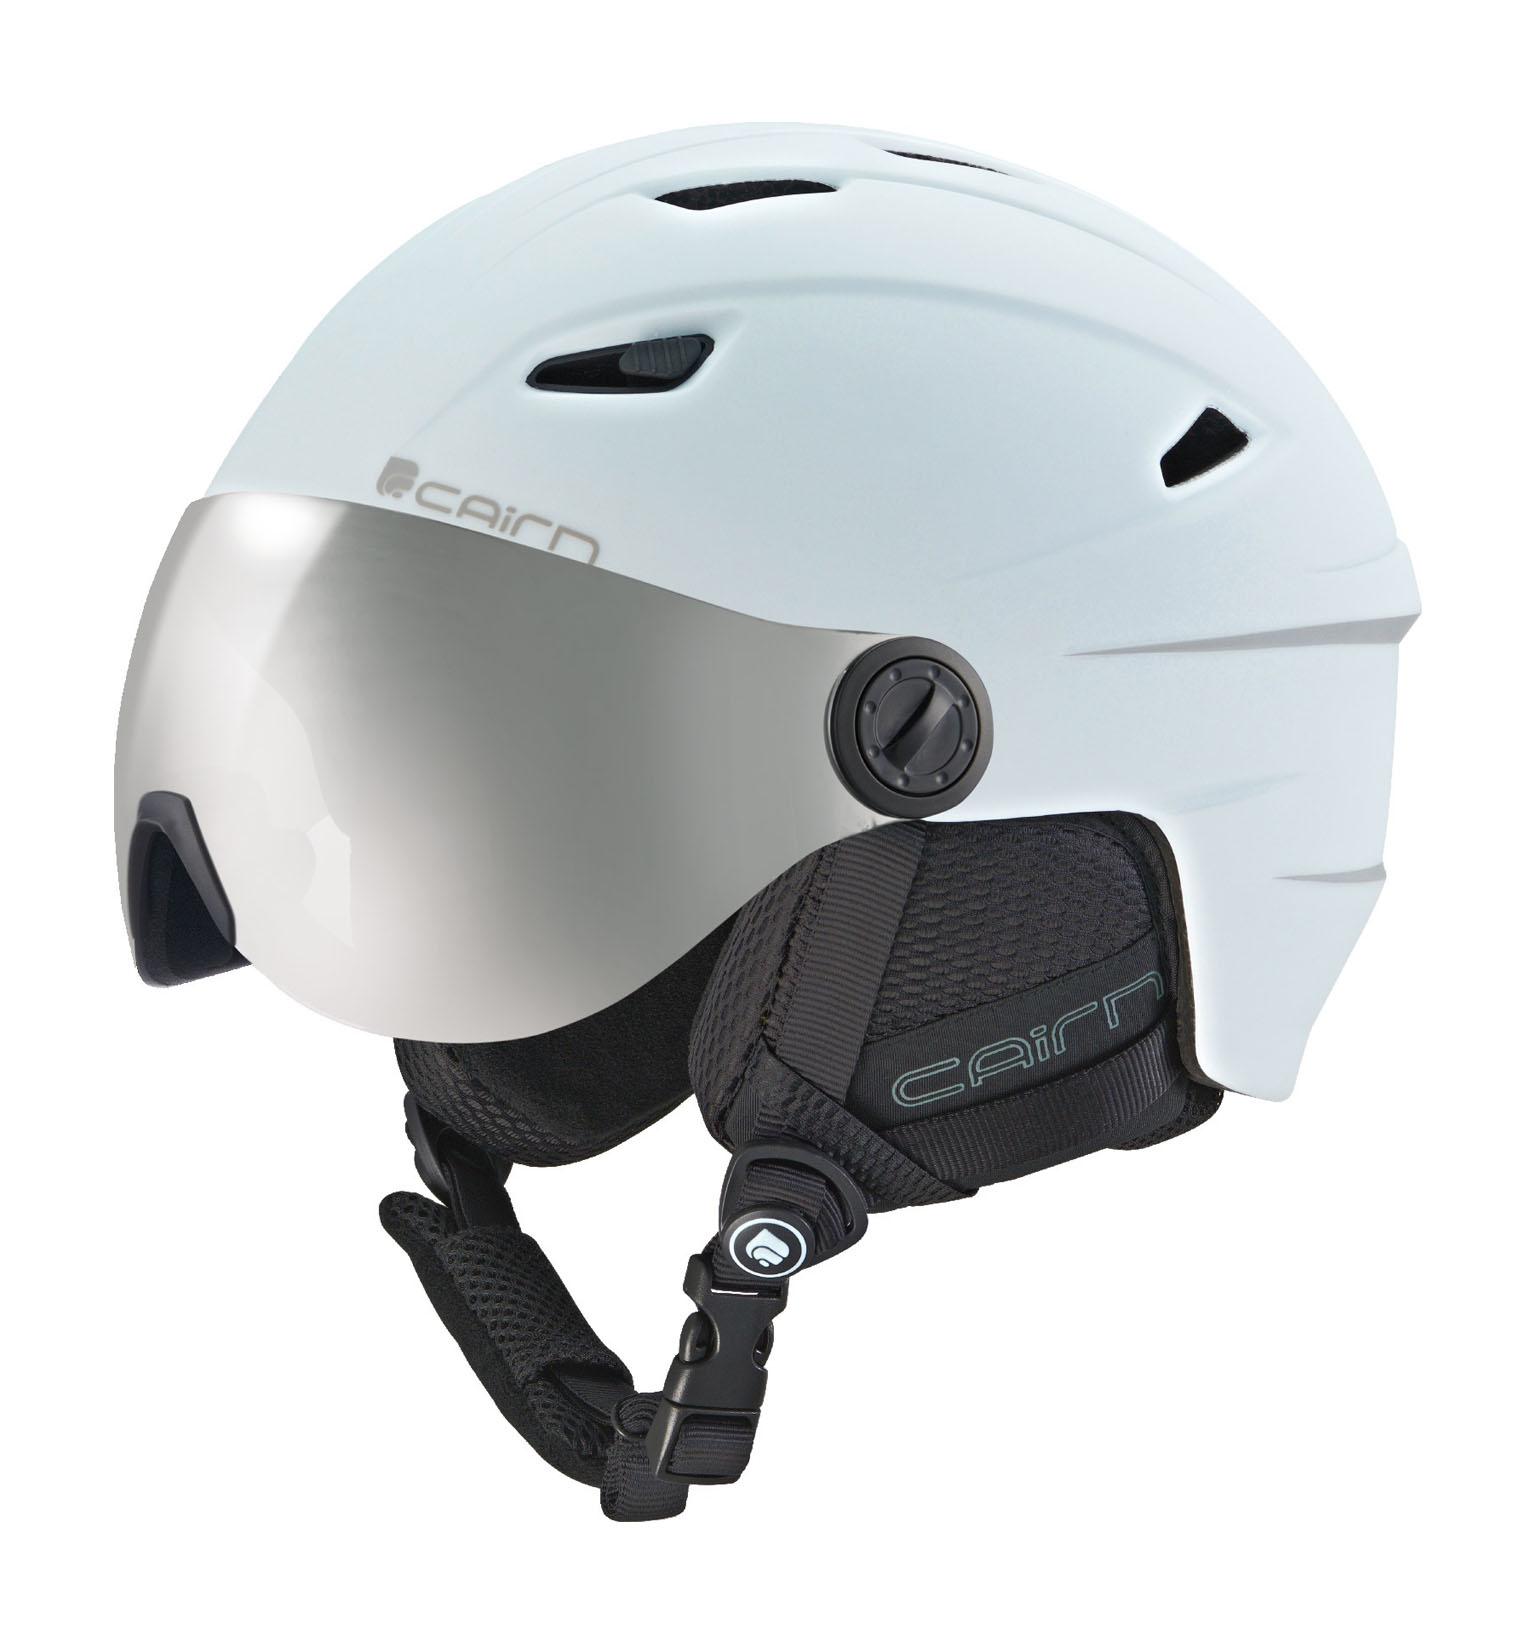 Ski kaciga Cairn ELECTRON VISOR 01